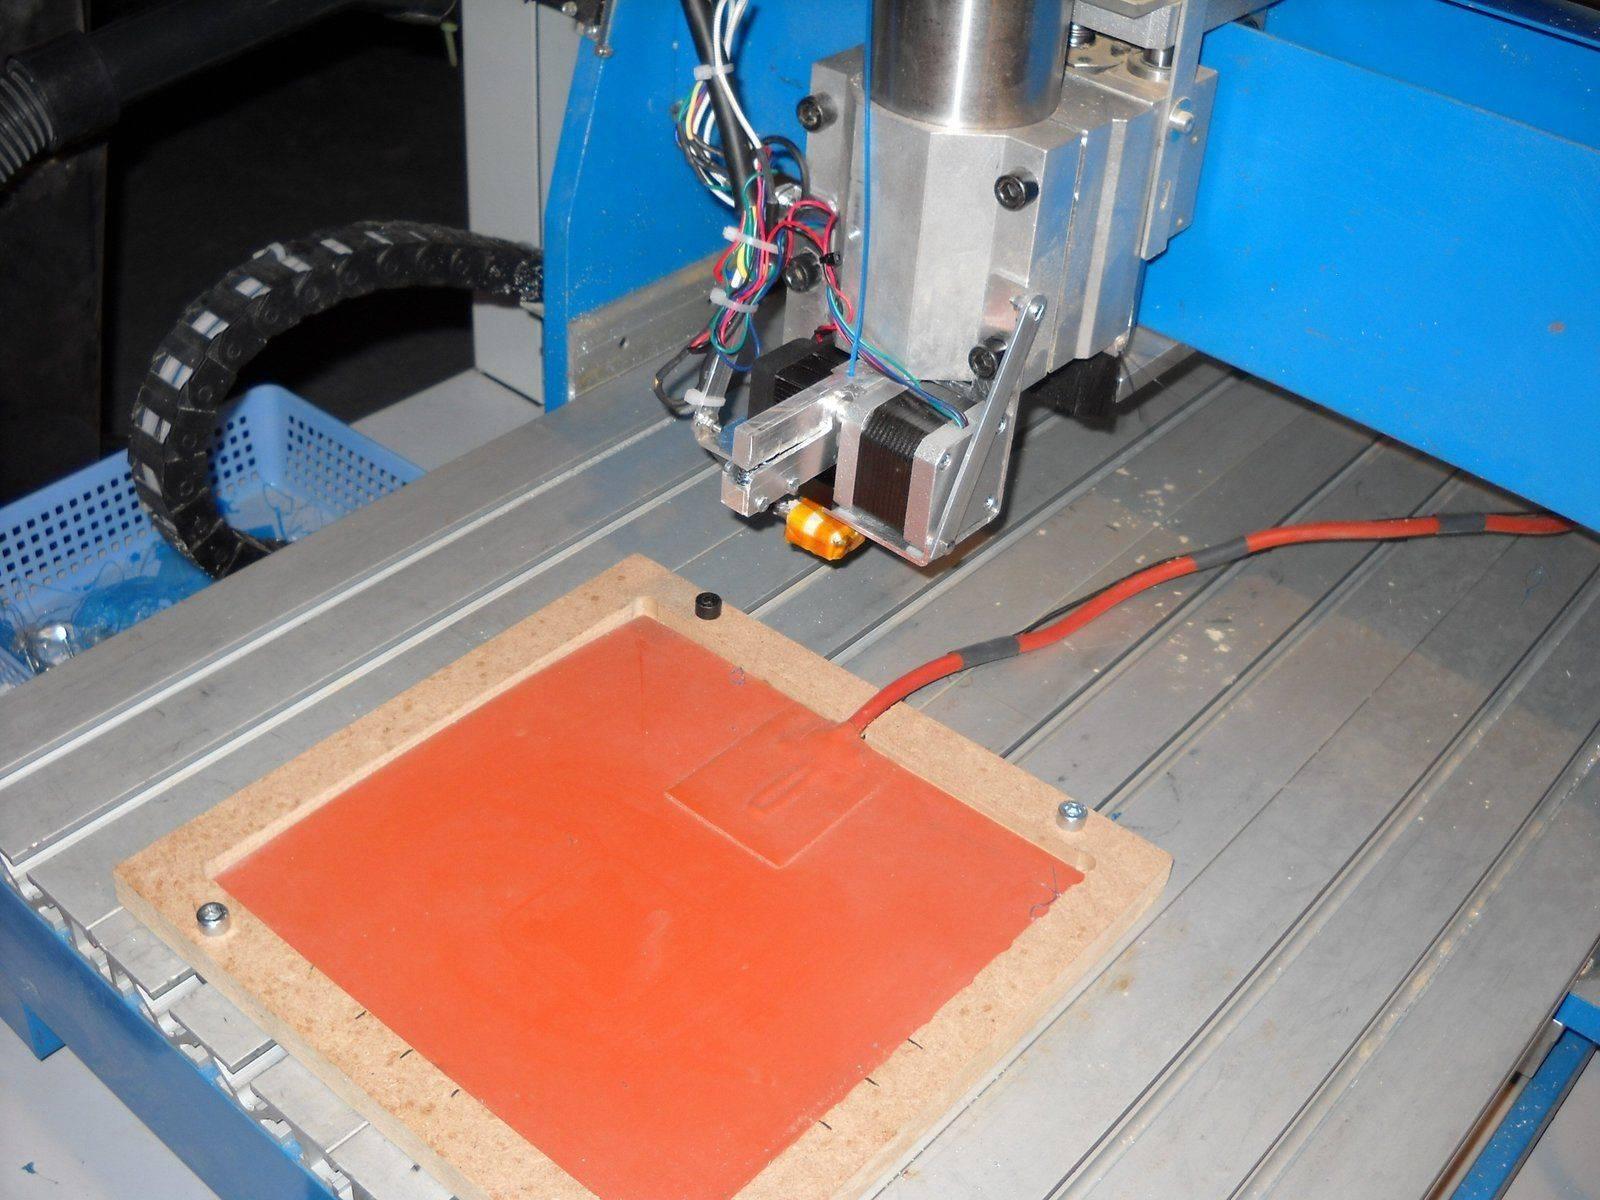 printer 3D.JPG